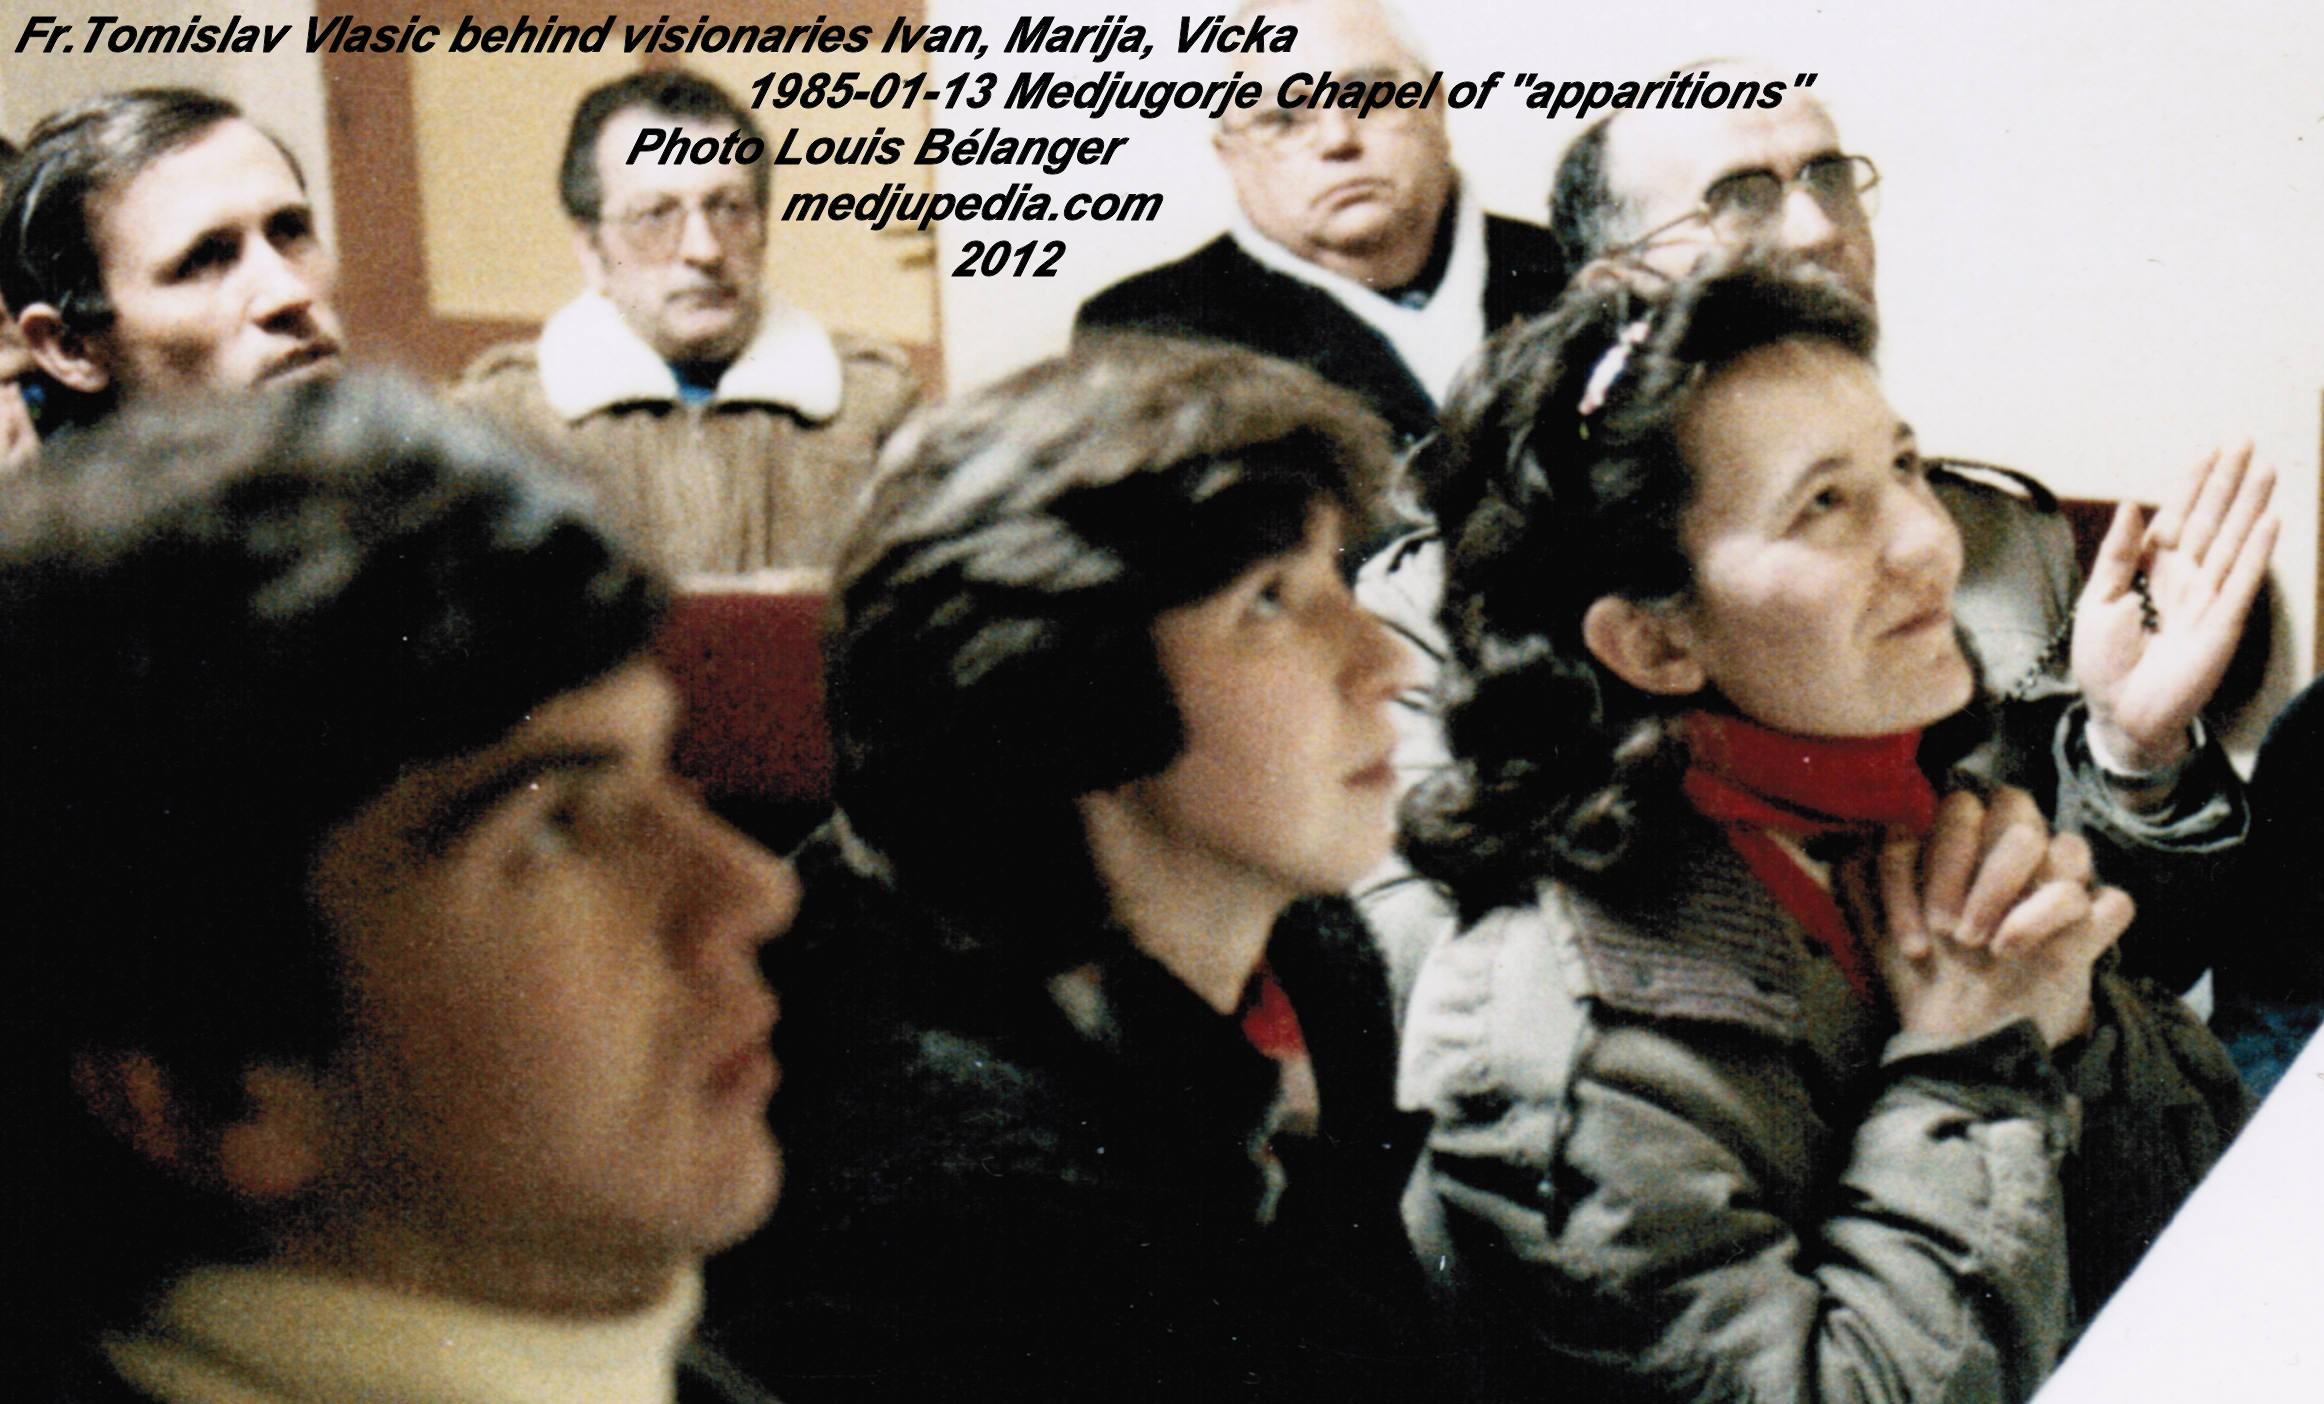 Fr. Tomislav Vlasic - Medjugorje - 1985-01-13